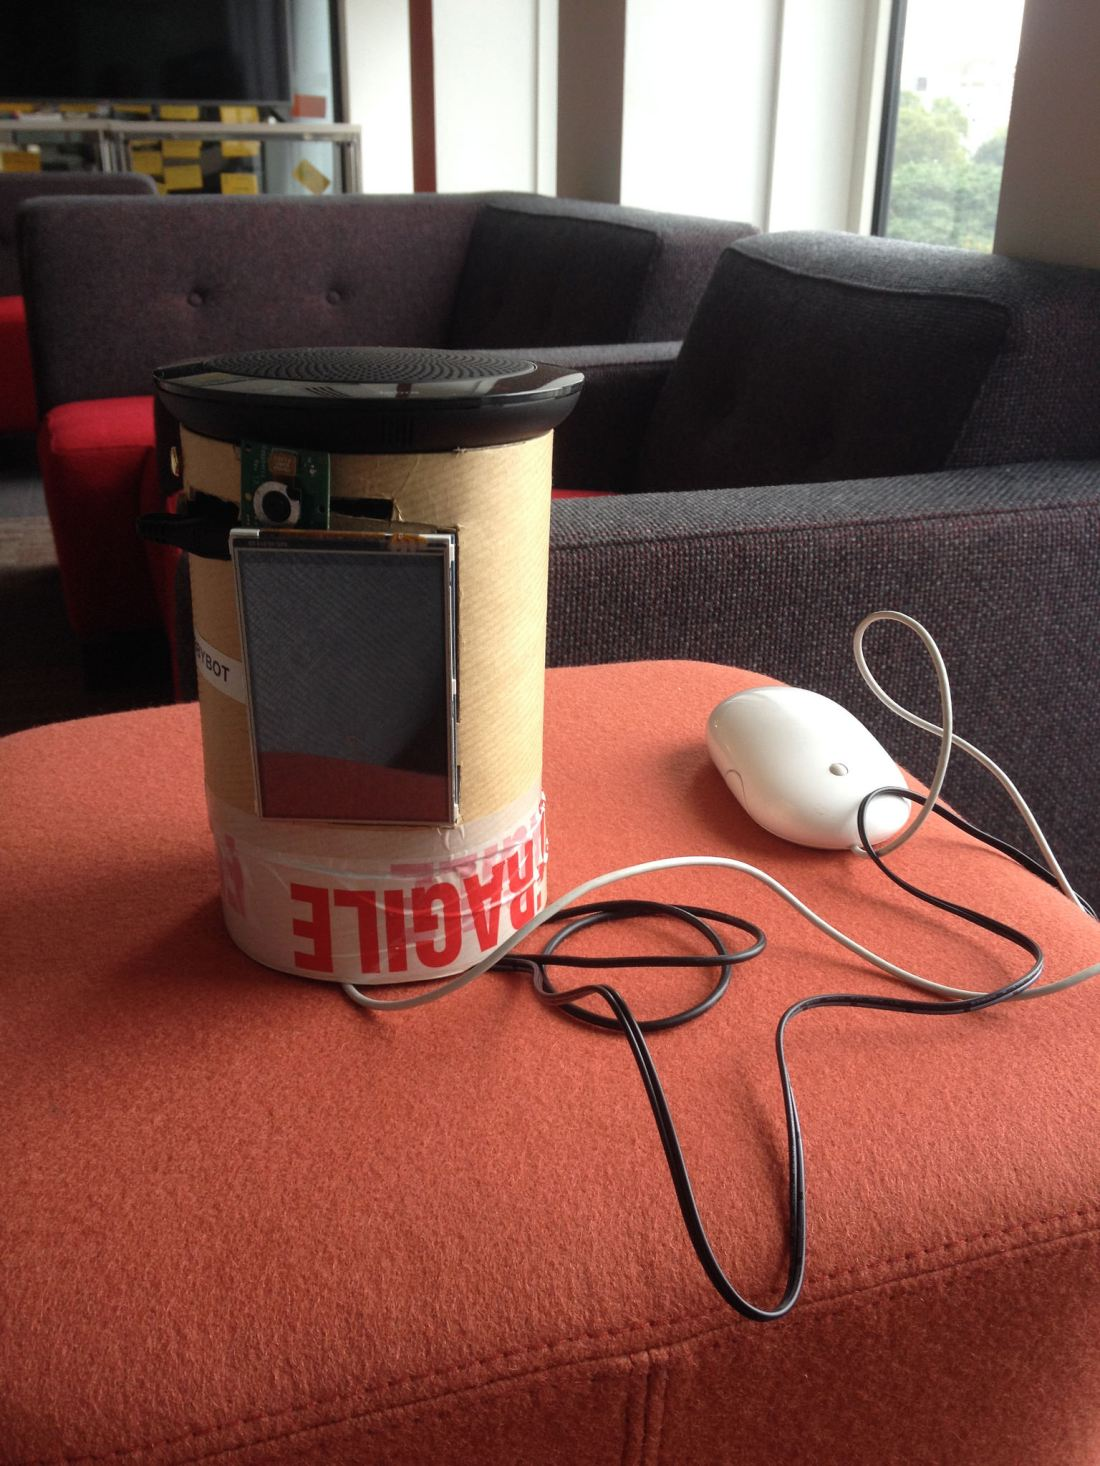 A presence robot with Chromium, WebRTC, Raspberry Pi 3 and EasyRTC